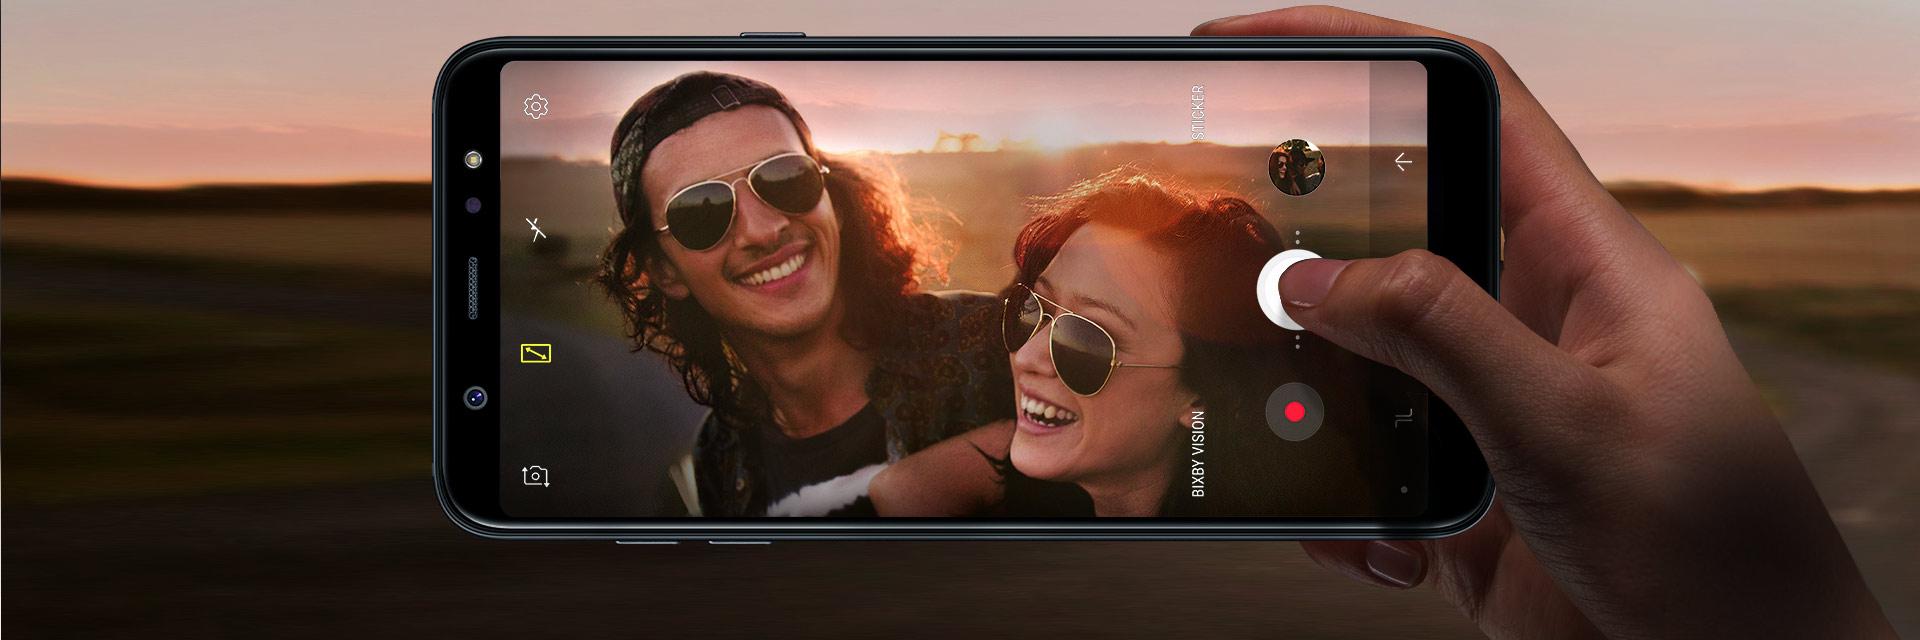 Samsung A6 Aparat Intro